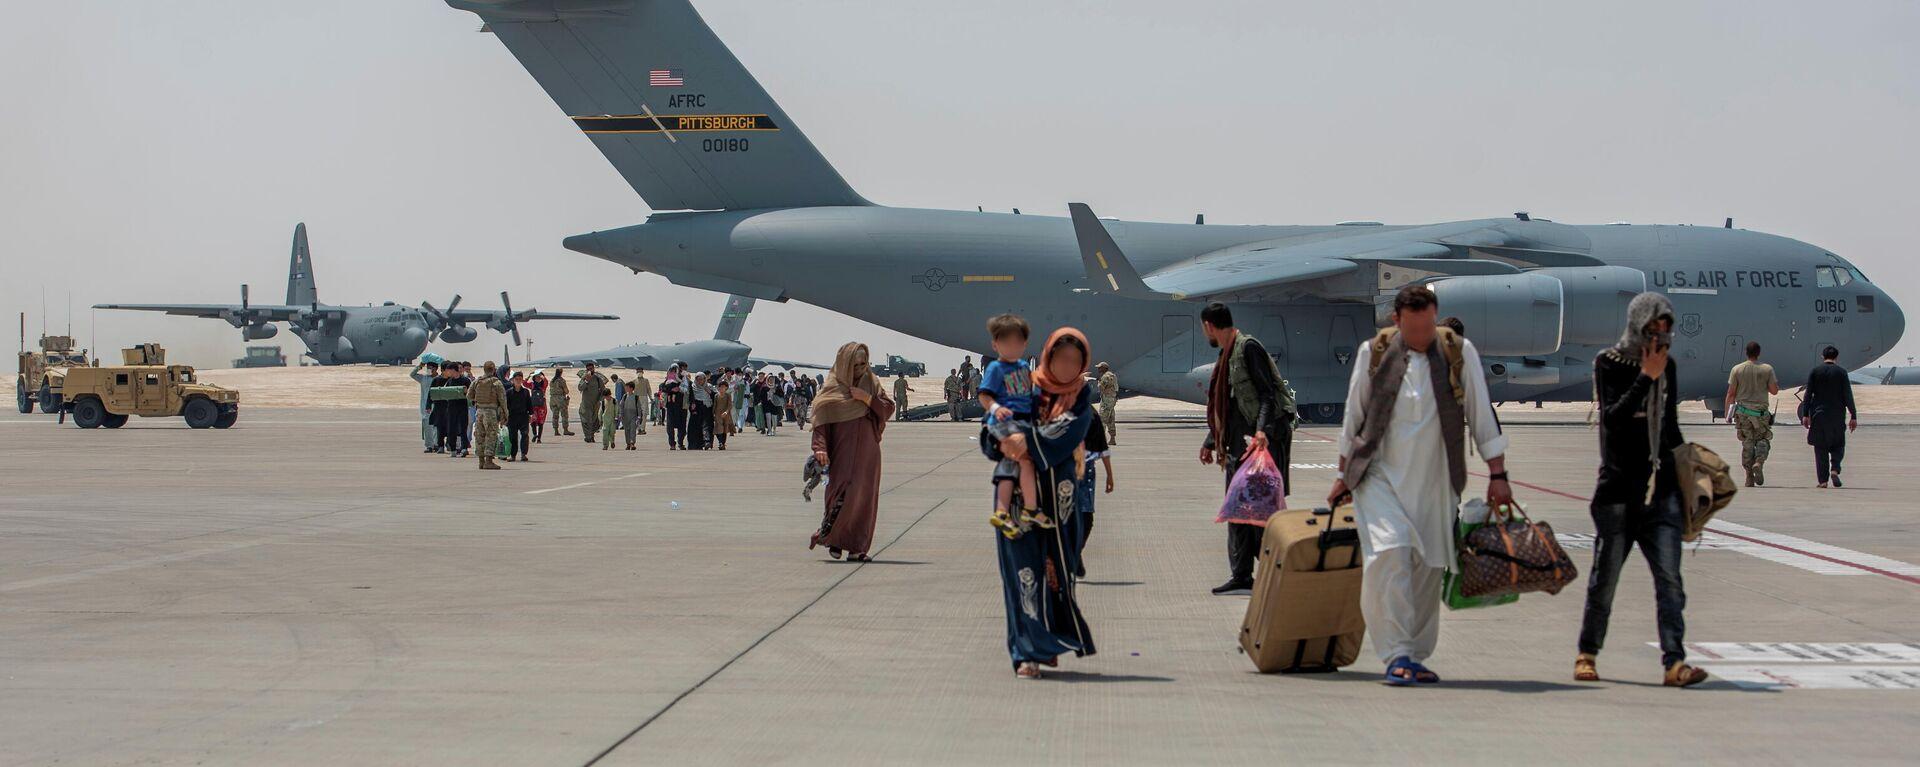 Эвакуация беженцев из аэропорта в Кабуле - Sputnik Таджикистан, 1920, 26.08.2021